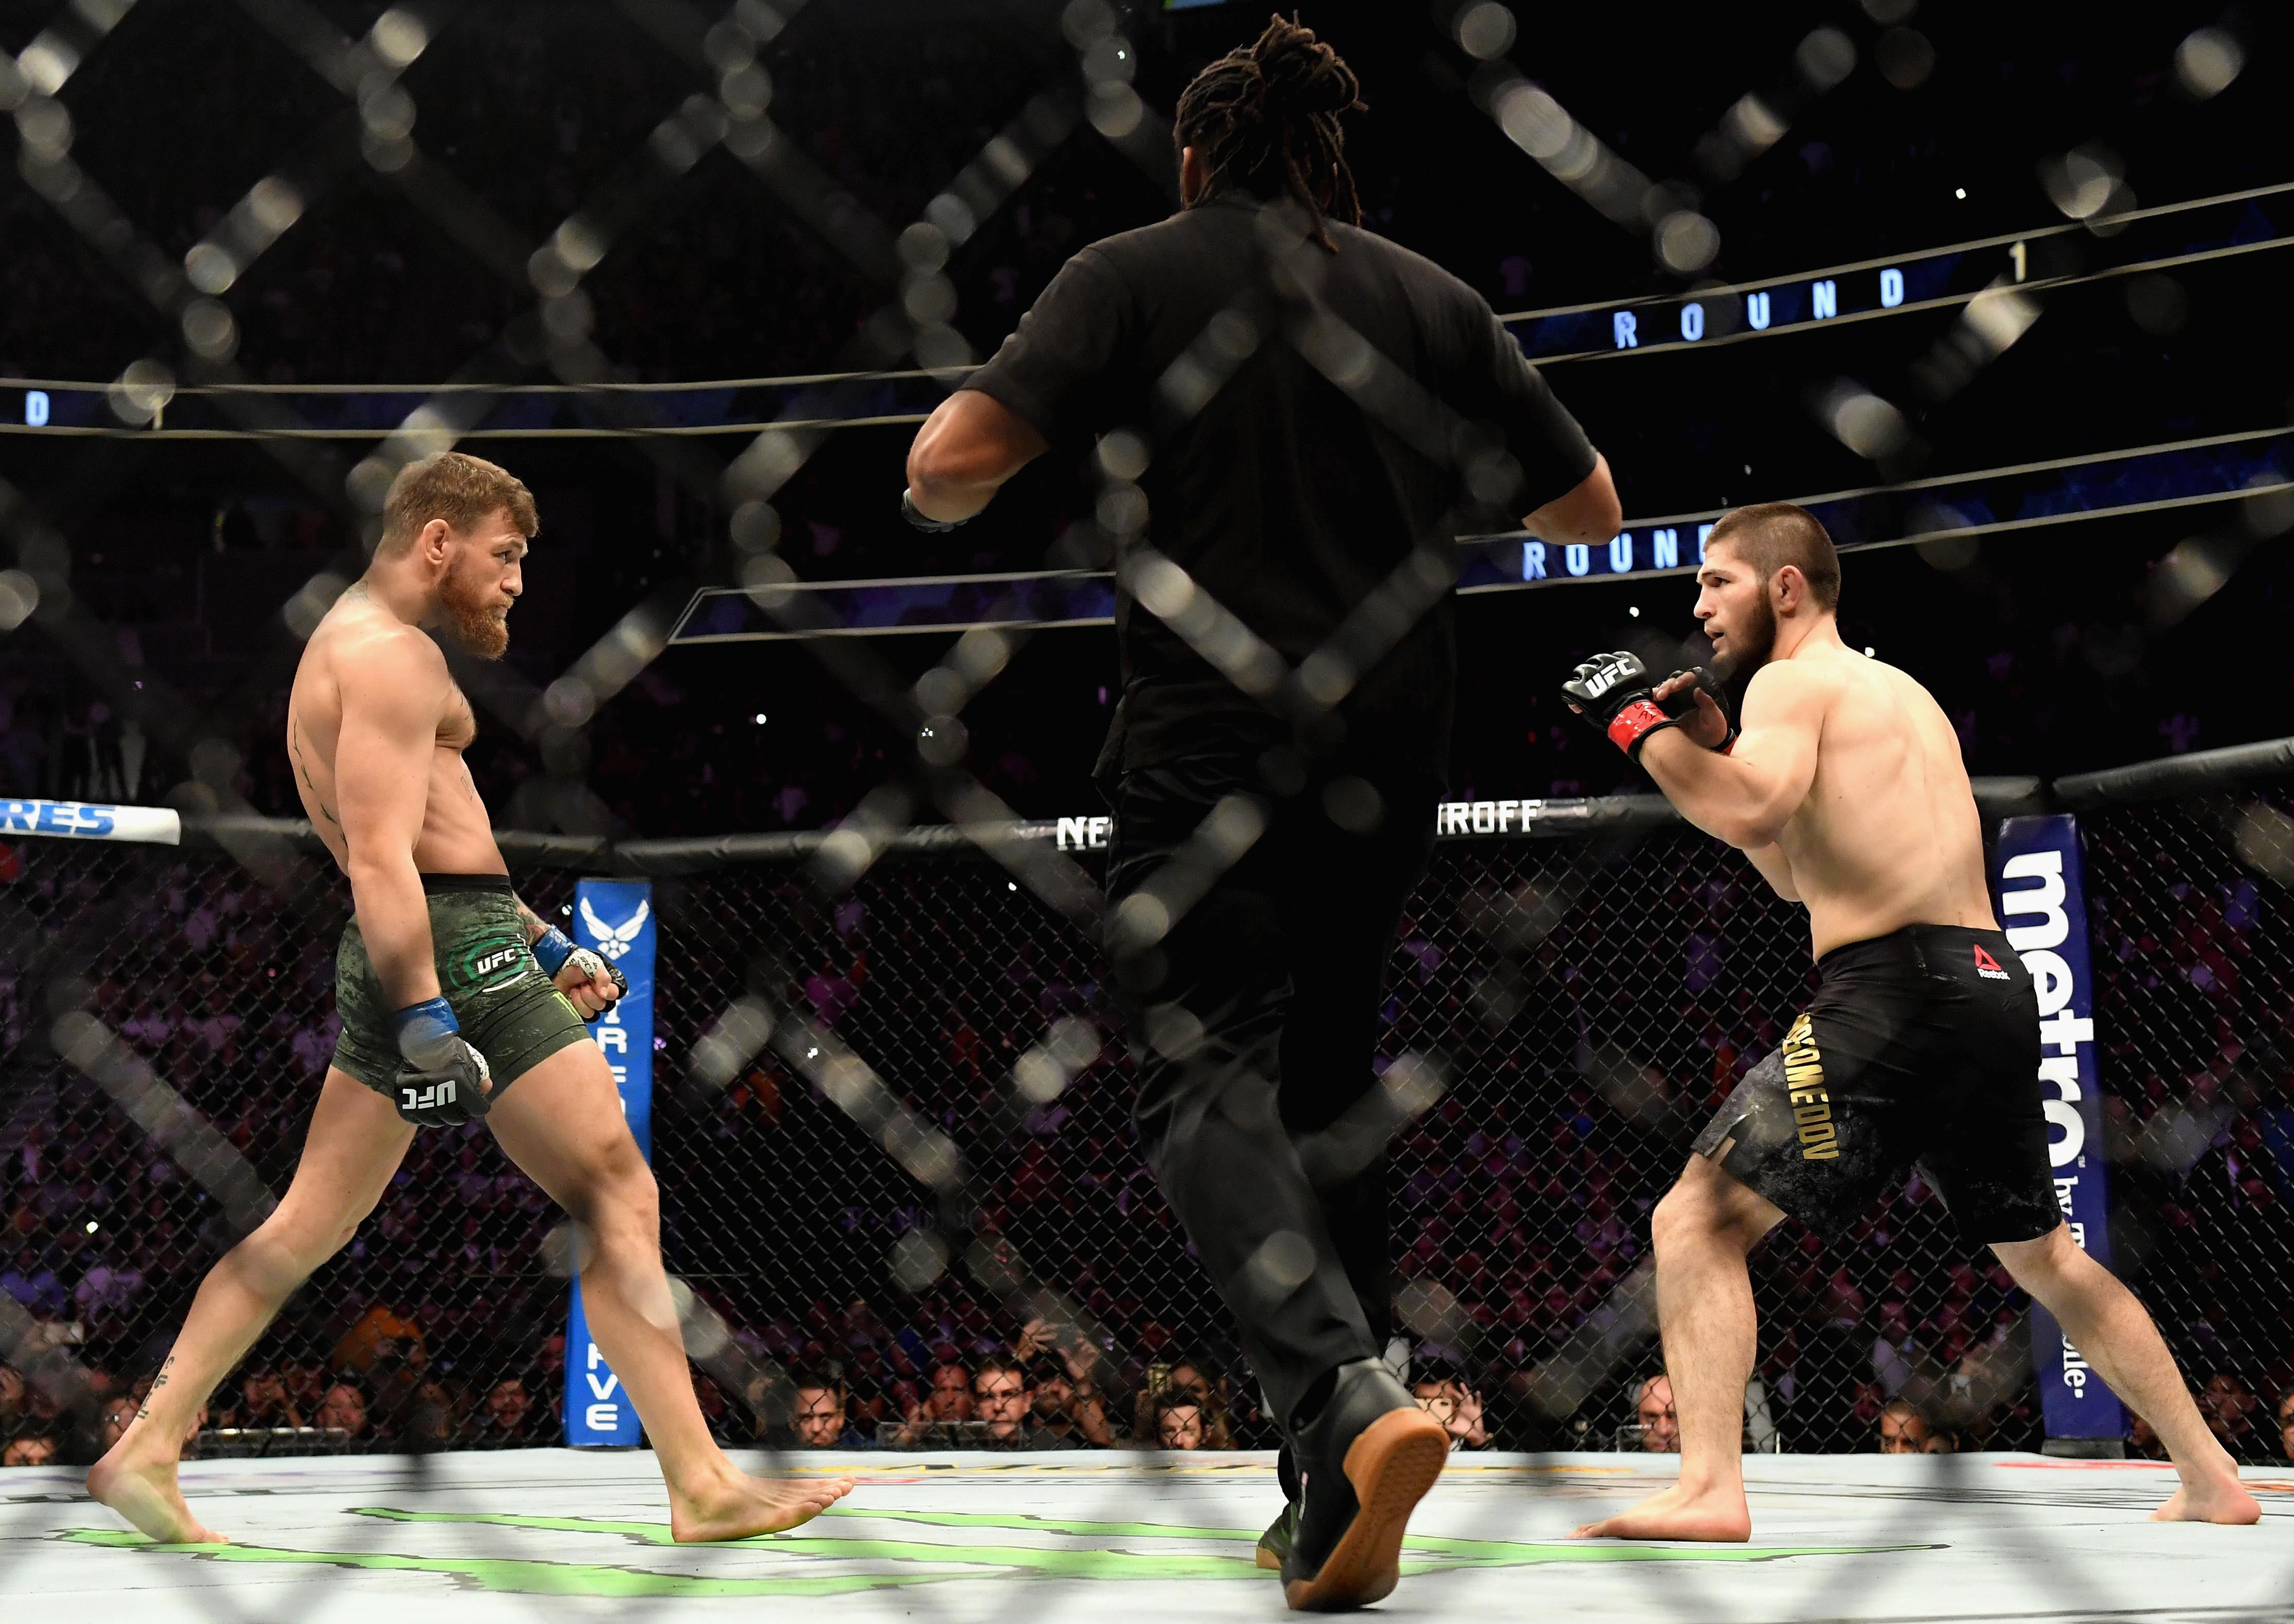 Conor McGregor, Khabib Nurmagomedov, Dana White, UFC